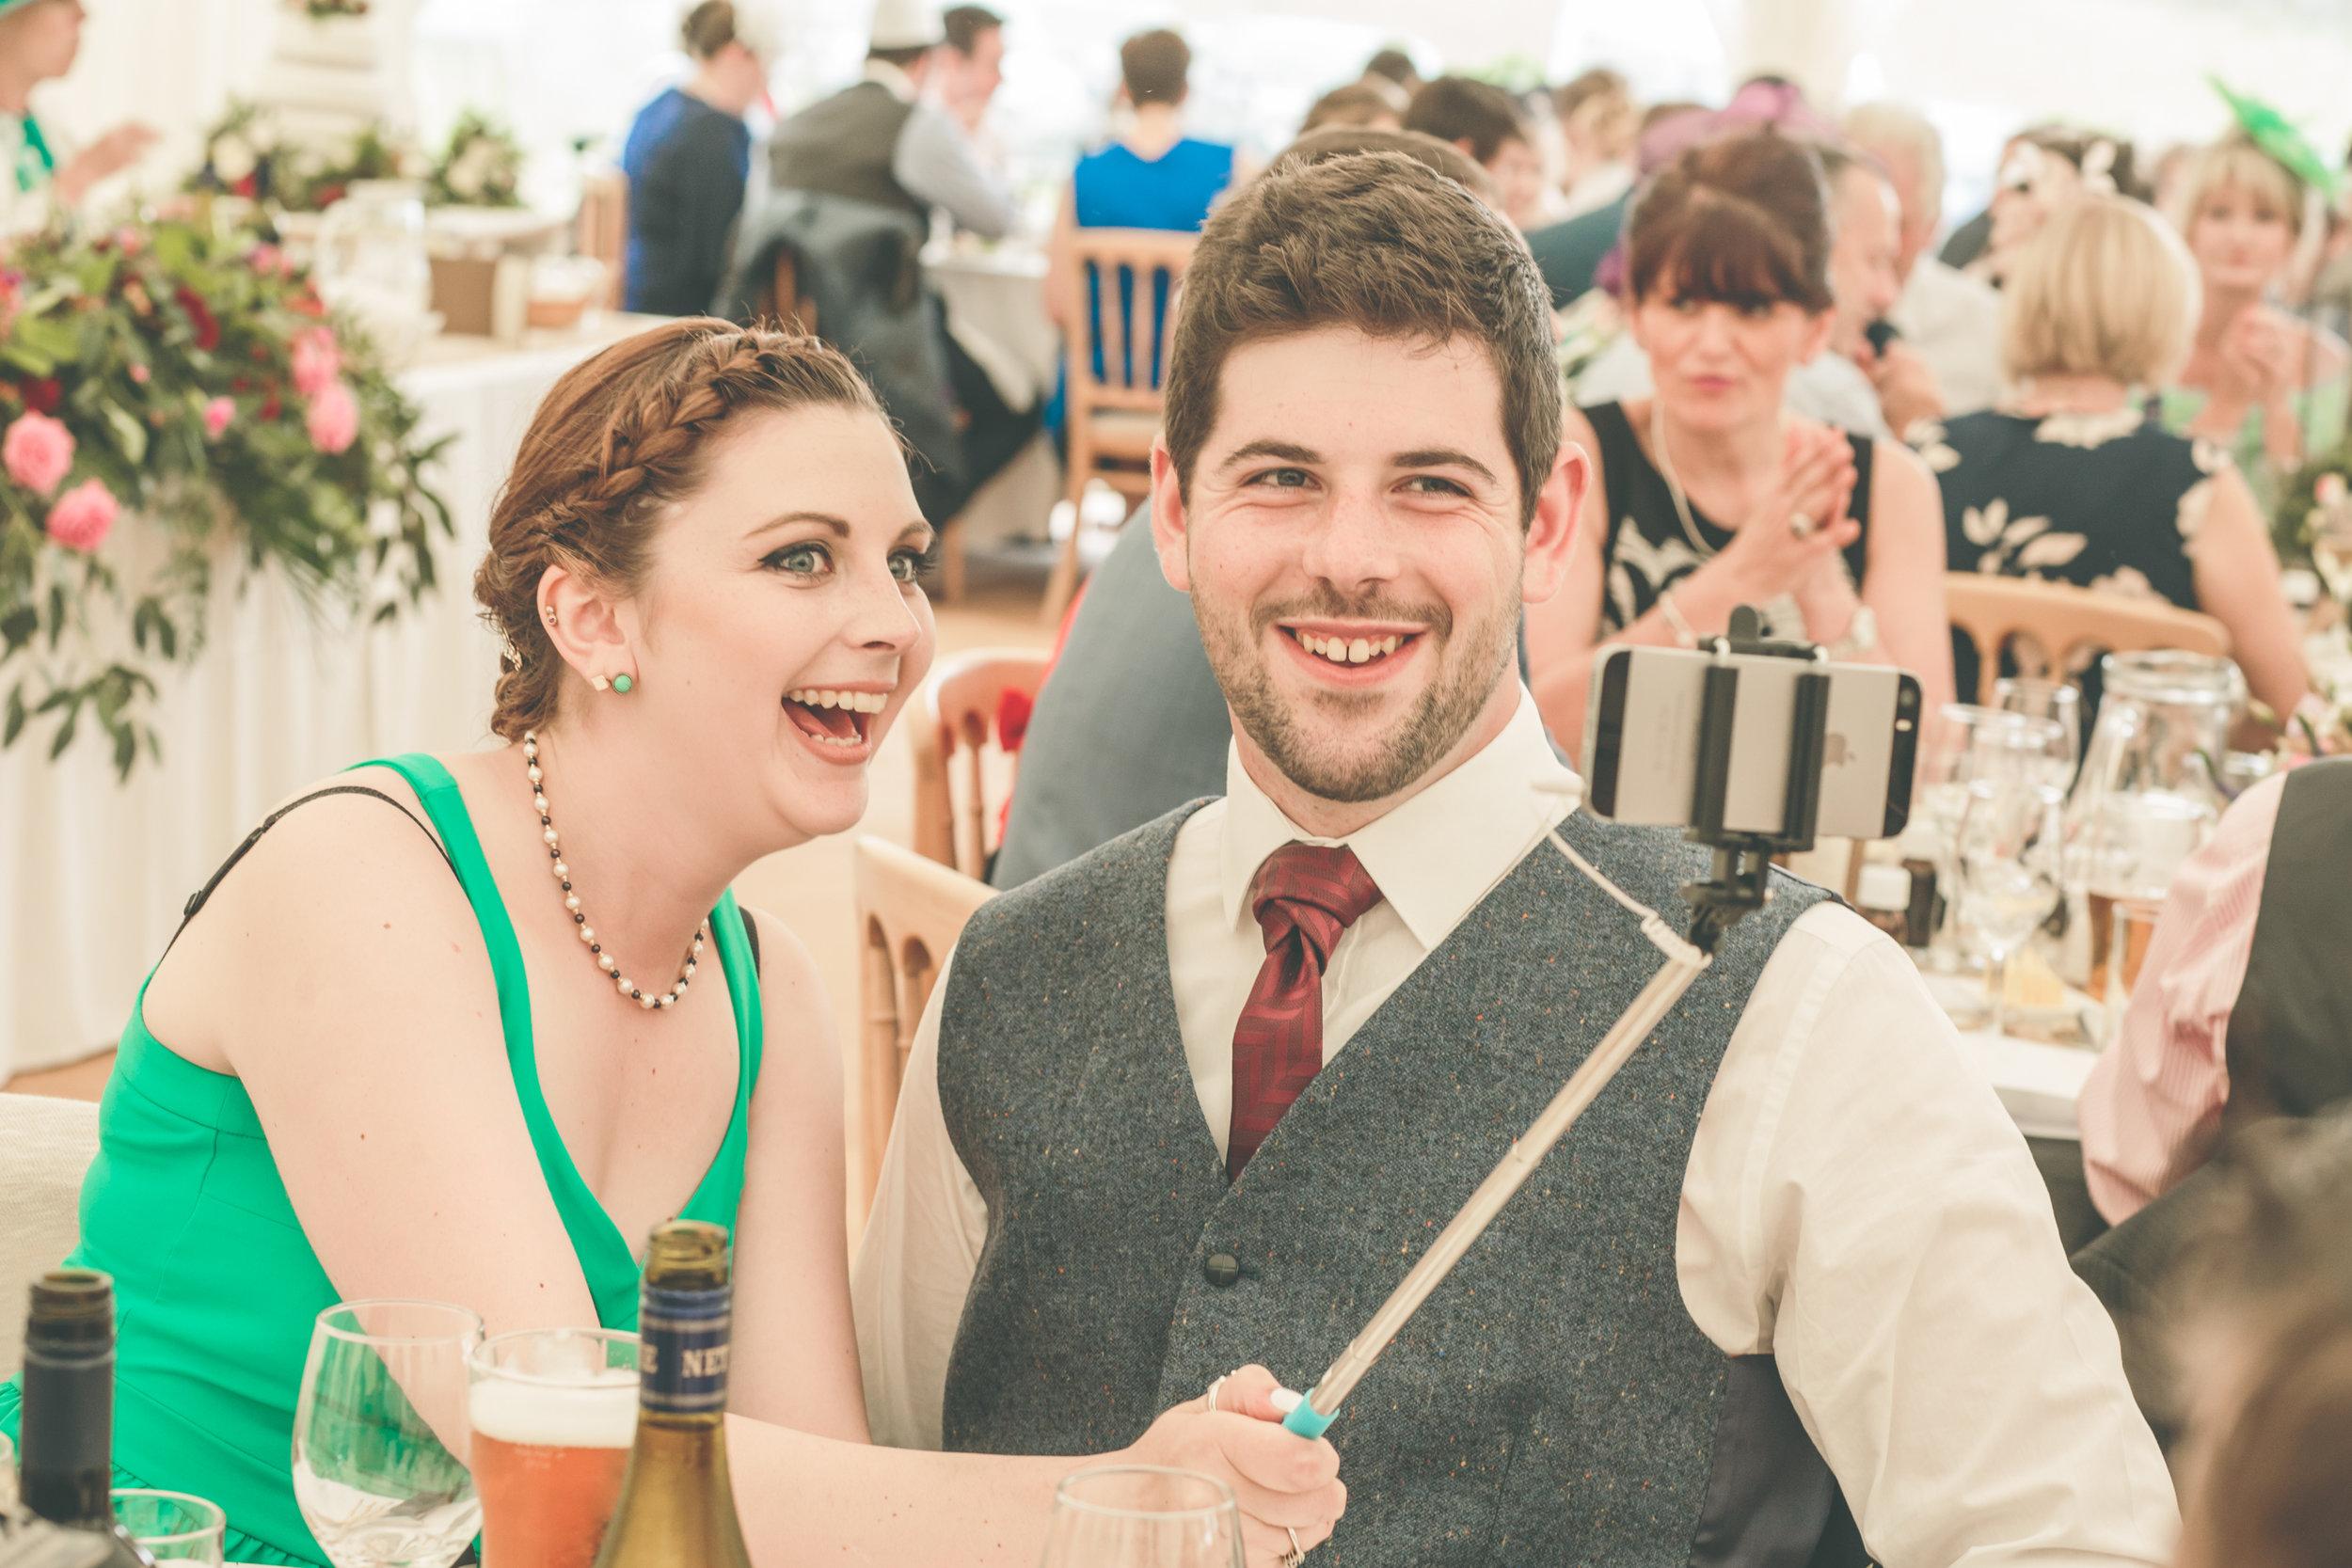 Wedding selfie sticks, summer photography wedding UK